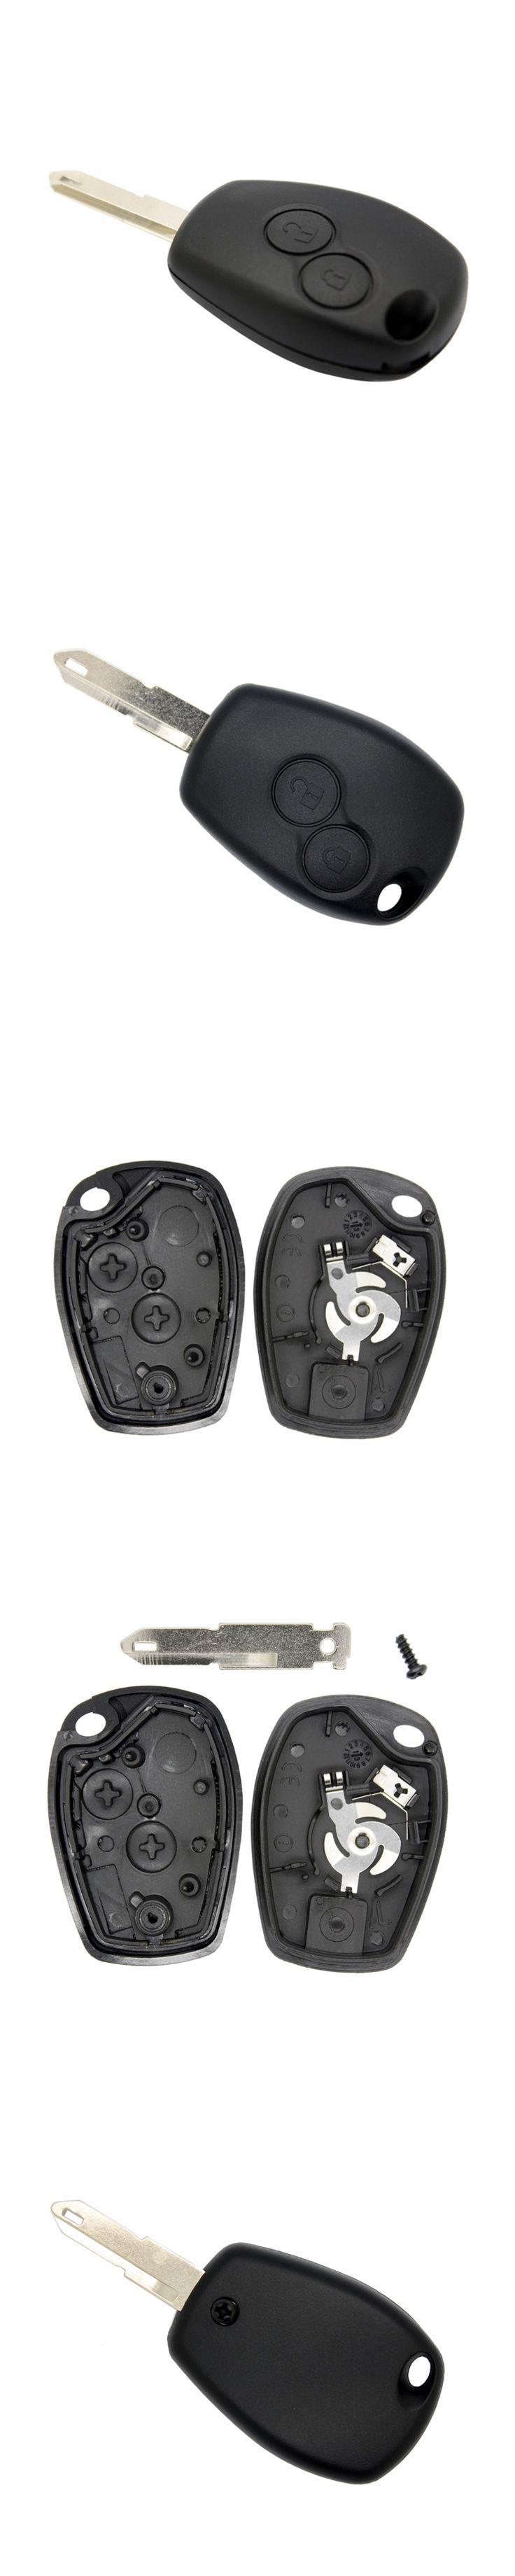 2 Button Remote Key Fob Shell Case Blank For Renault Duster Logan Fluence Clio Vivaro Movano Traffic Kangoo